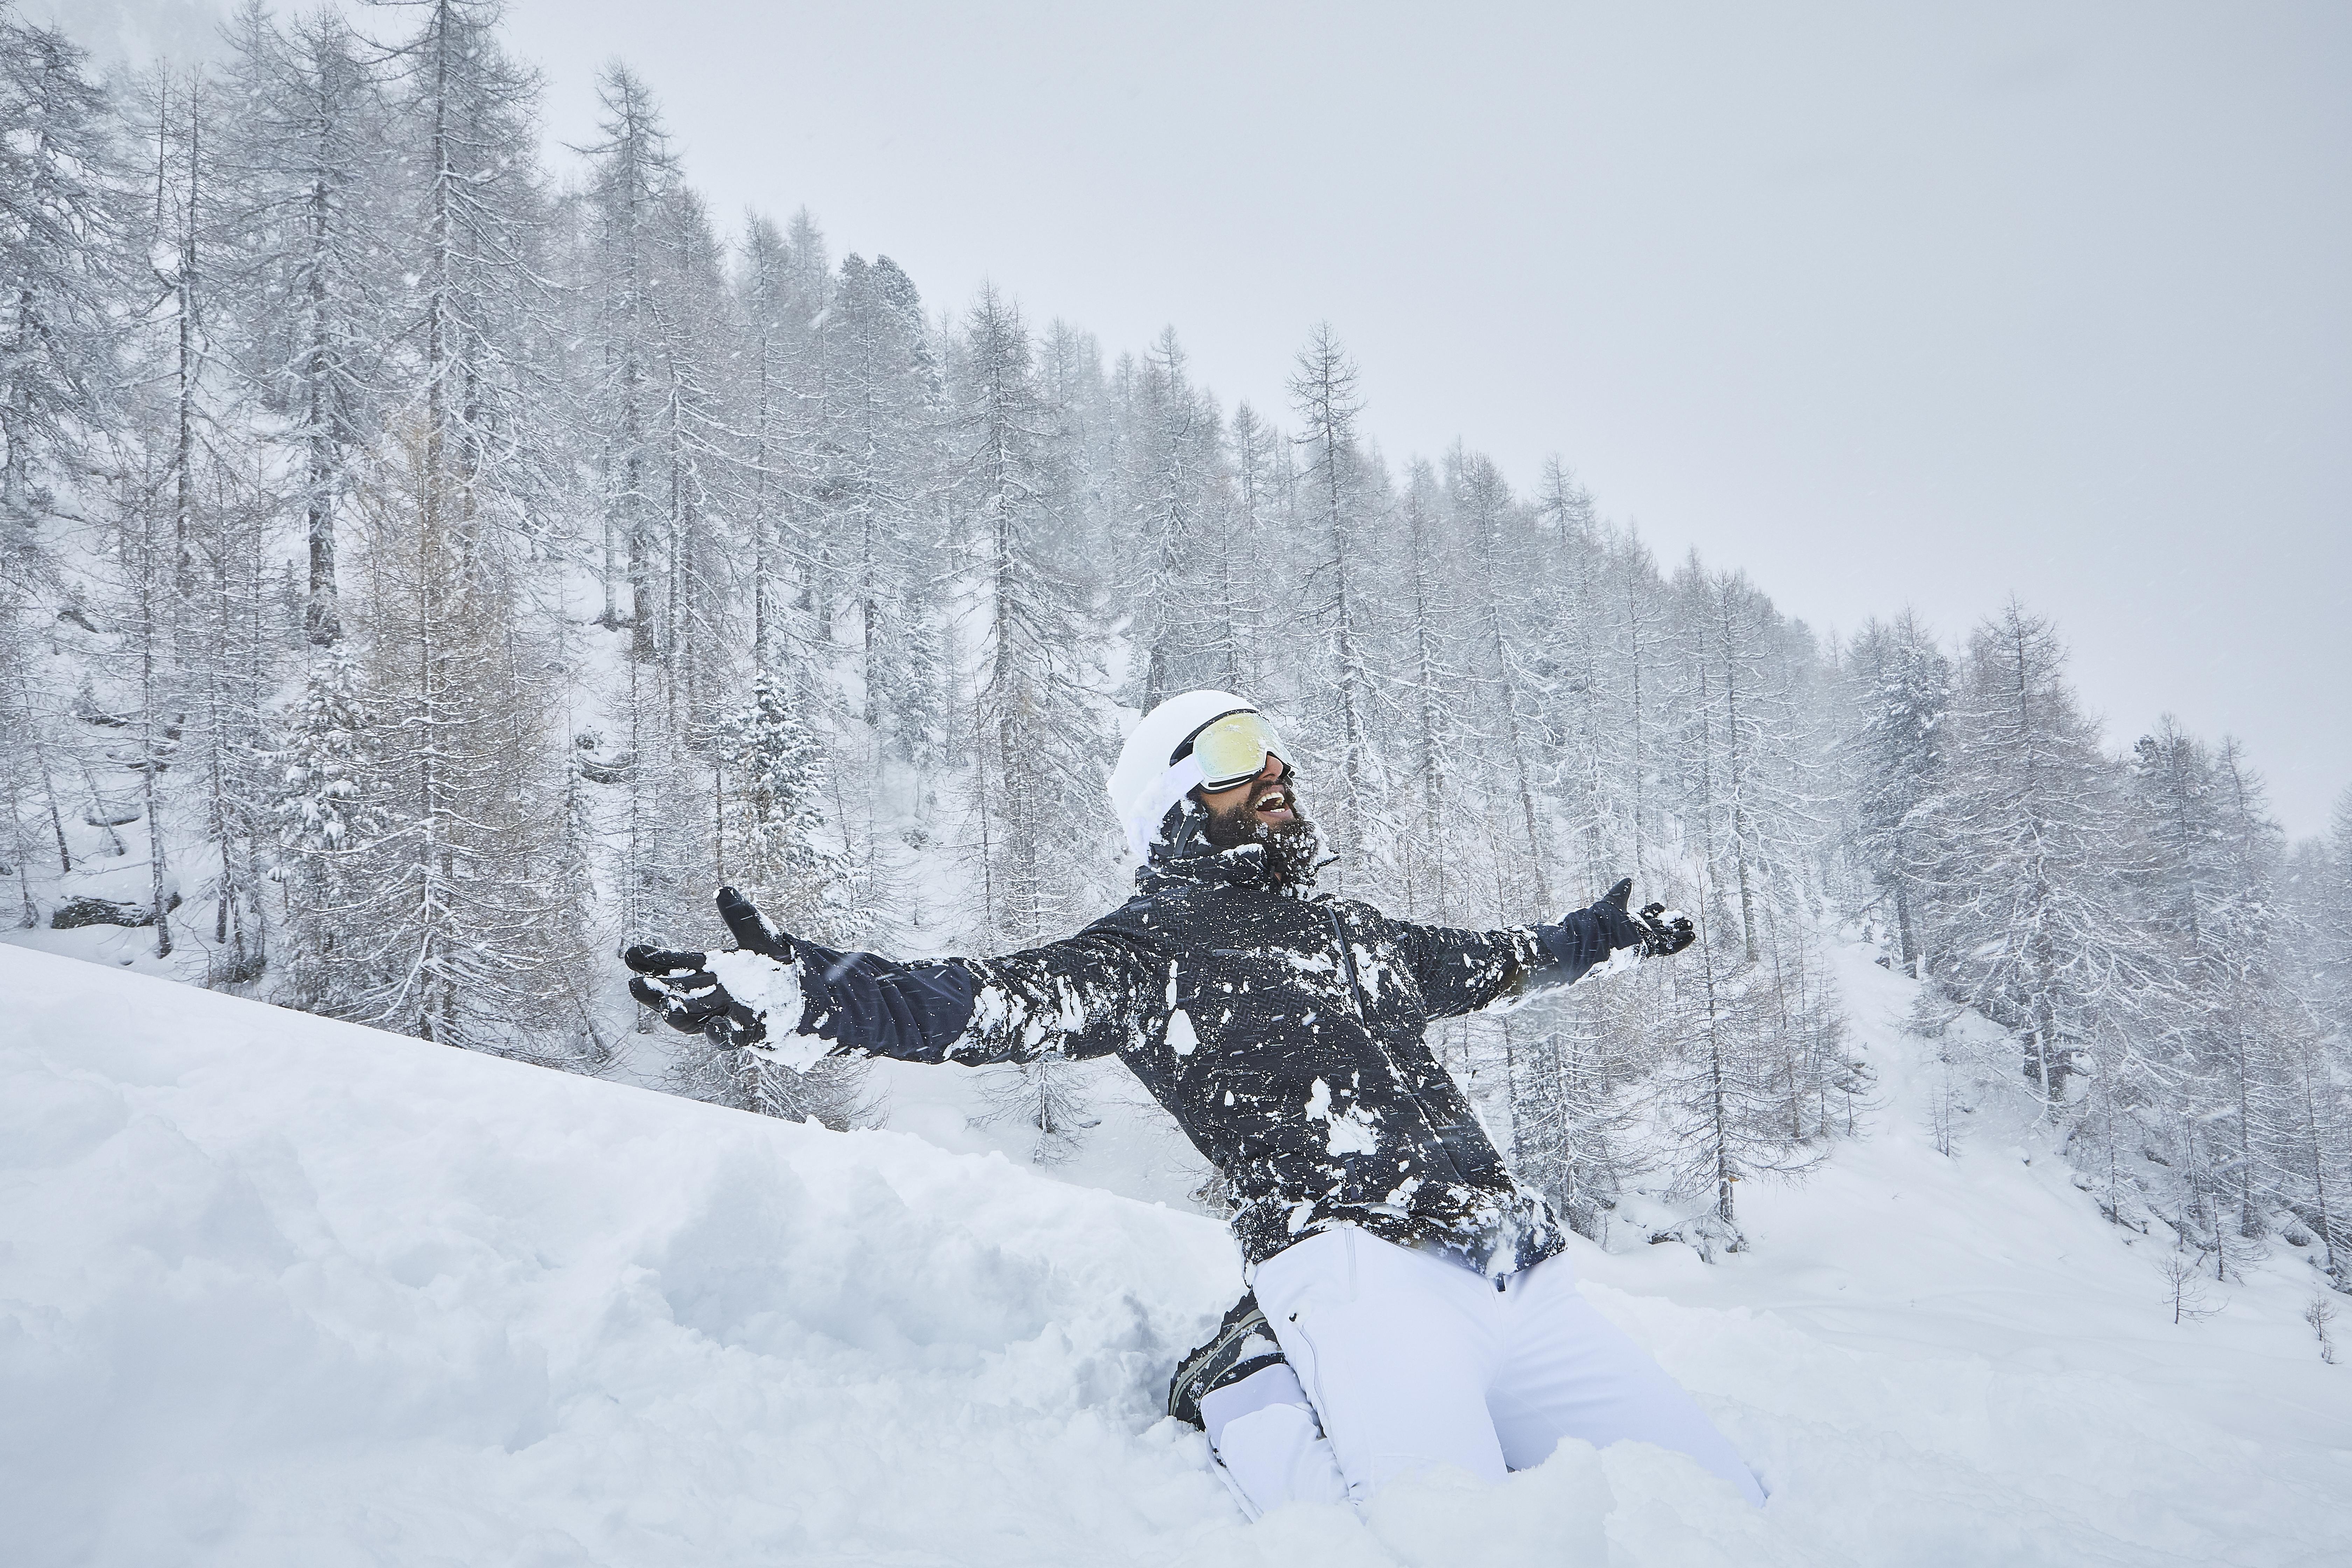 Bollywood Star zu Gast in St. Moritz Slide 1